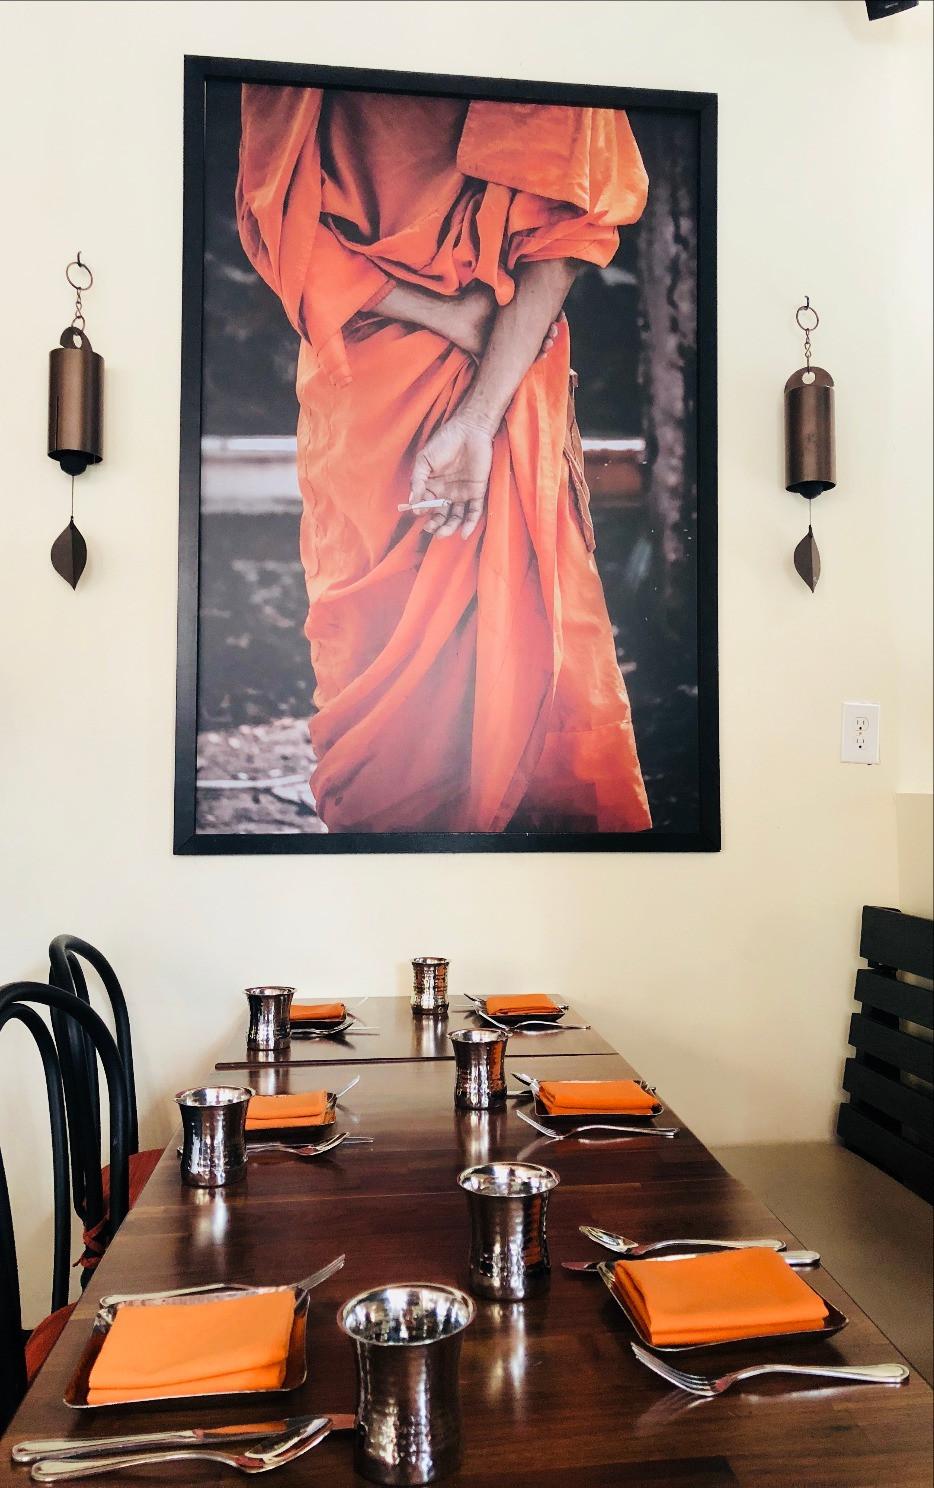 Old Monk, NYC Food, Food Blog, Food Photos, Brunch with Sam, Brunch, Indian Food, Restaurants in New York